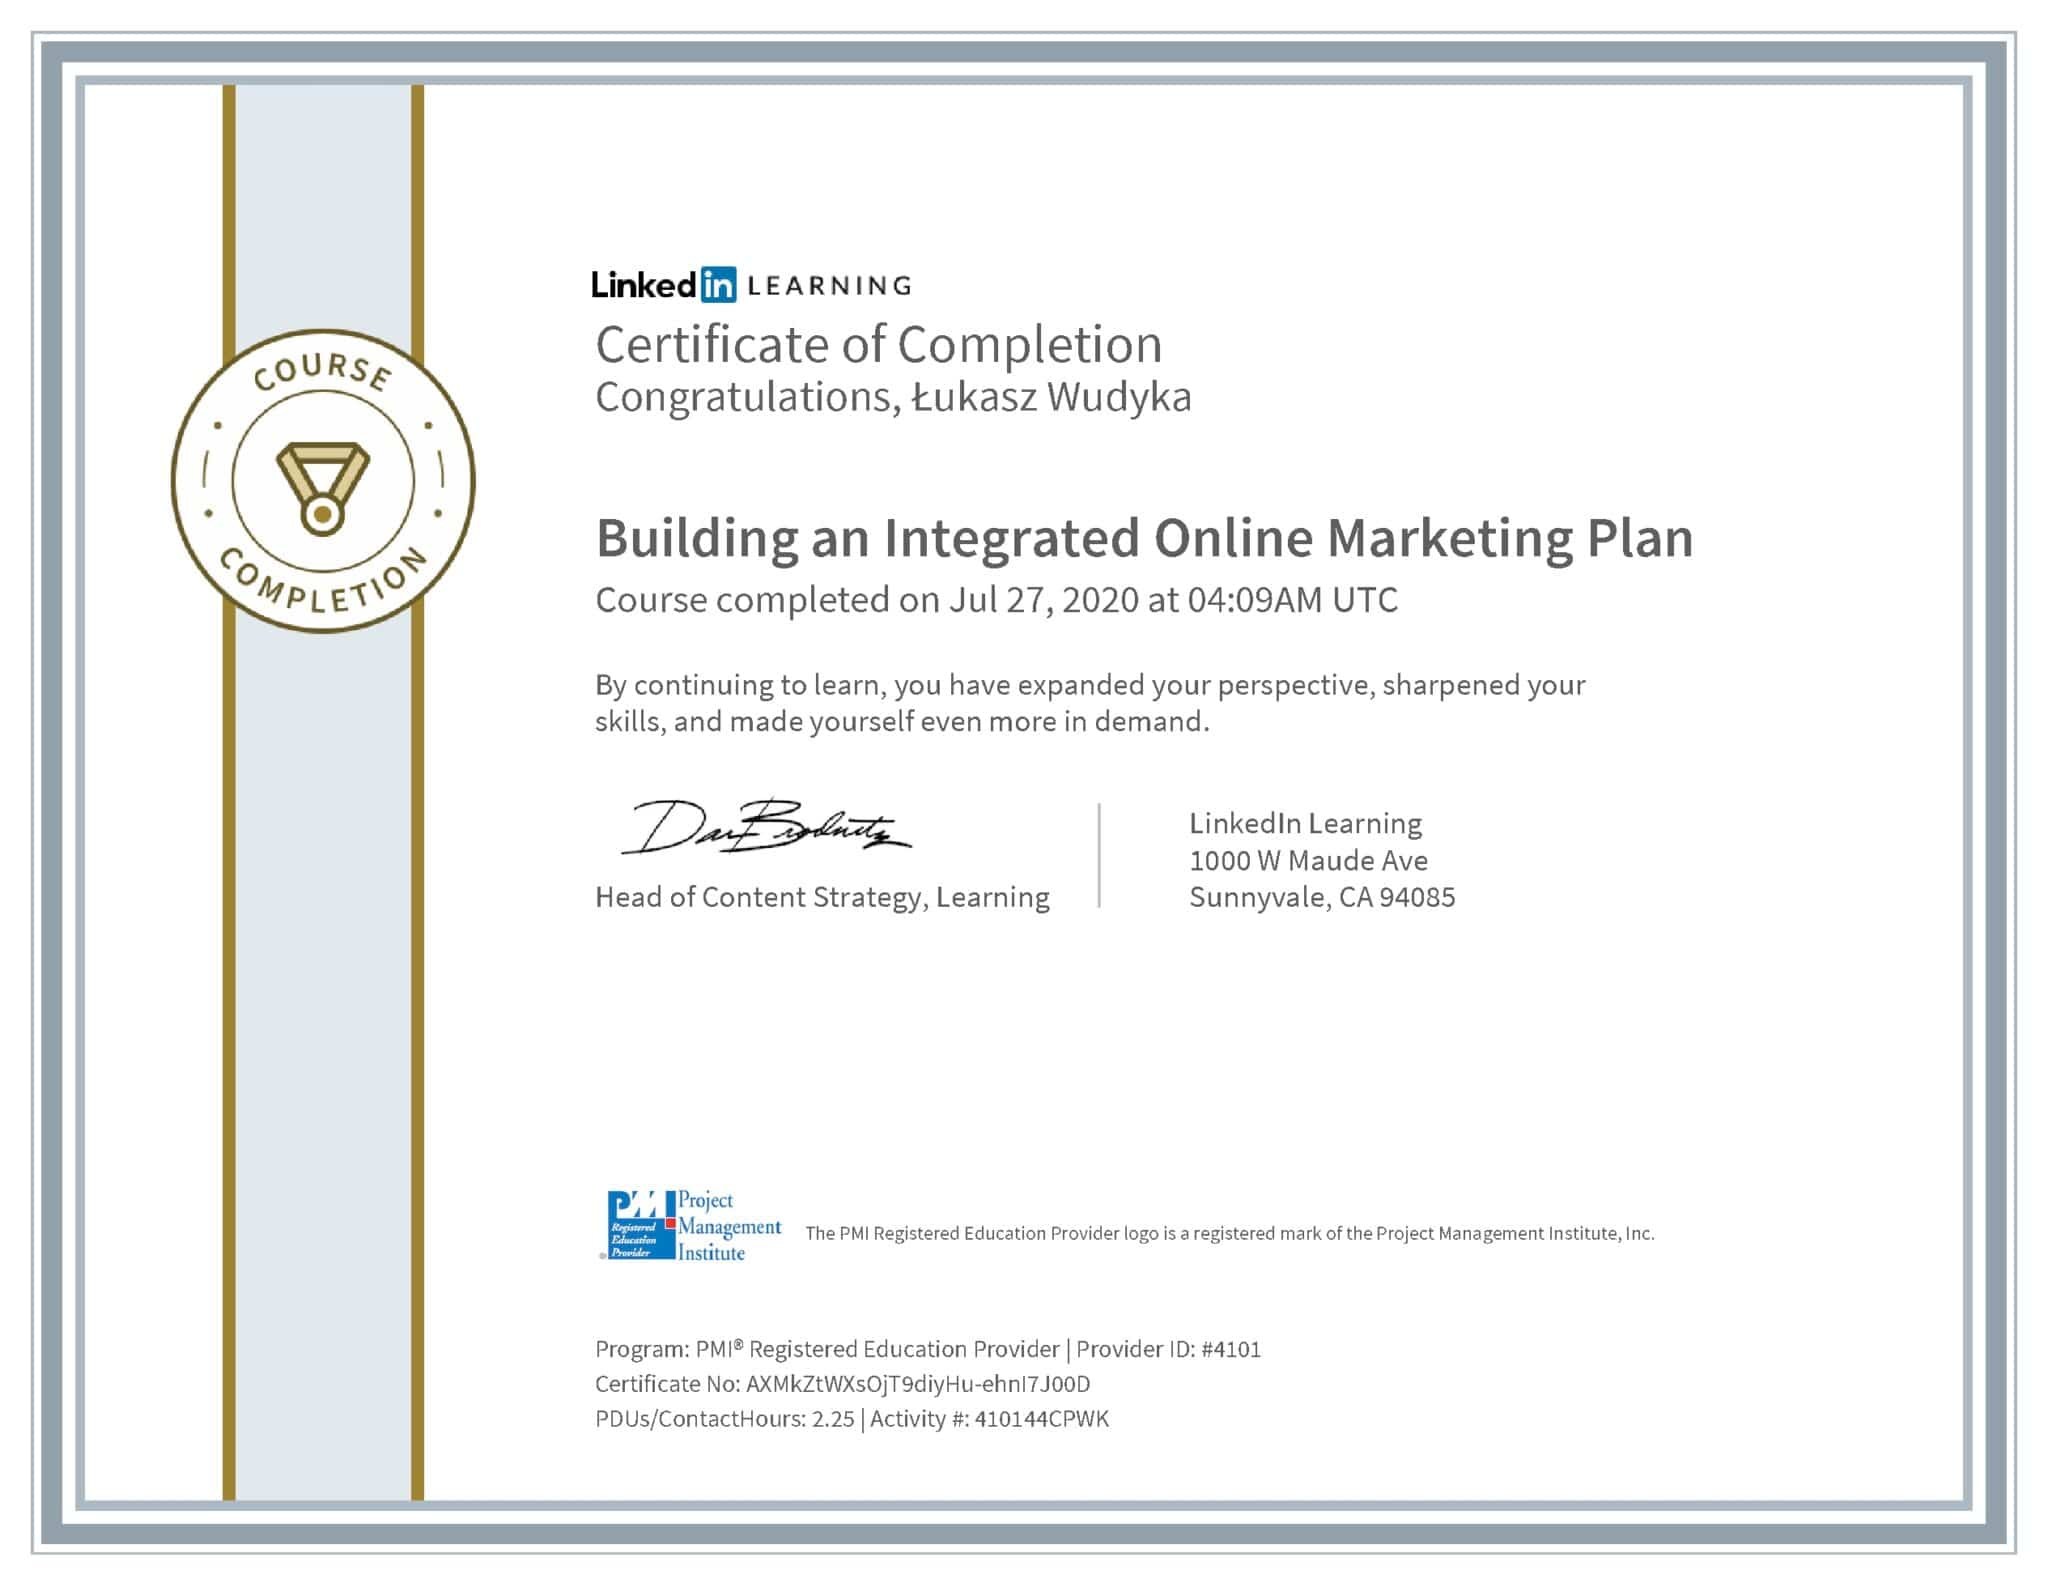 Łukasz Wudyka certyfikat LinkedIn Building an Integrated Online Marketing Plan PMI